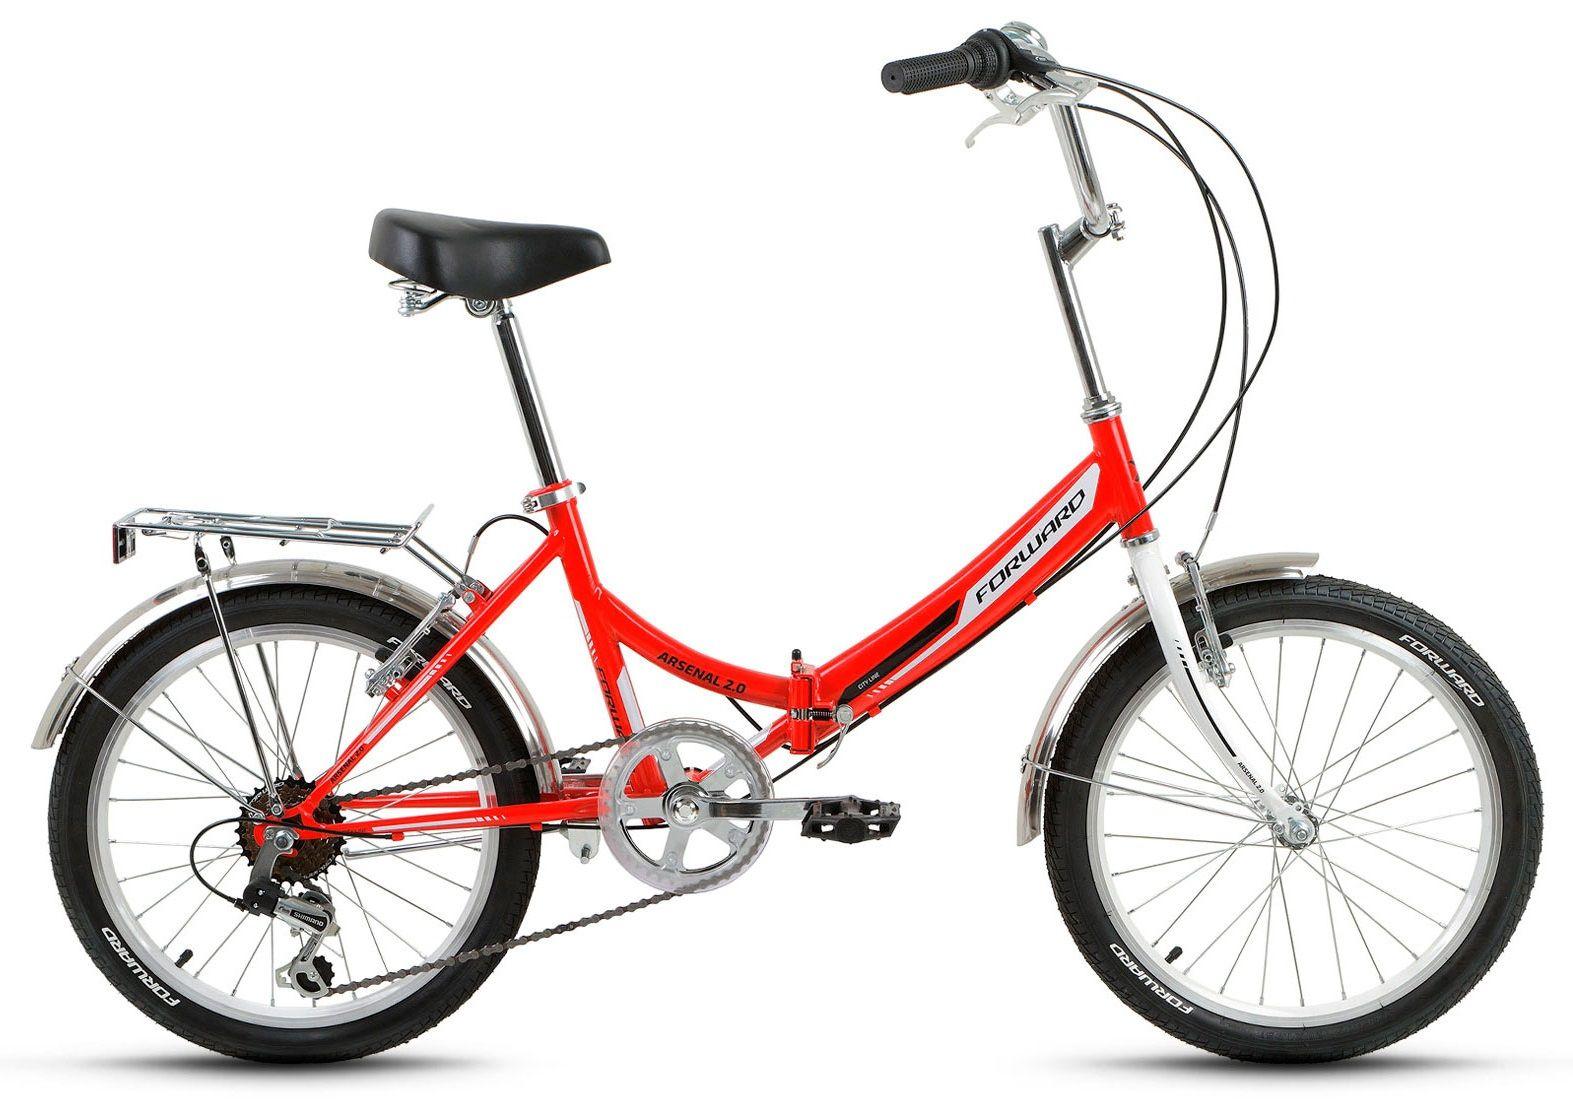 Велосипед Forward Arsenal 2.0 2018 велосипед forward arsenal 2 0 красный ростовка 14